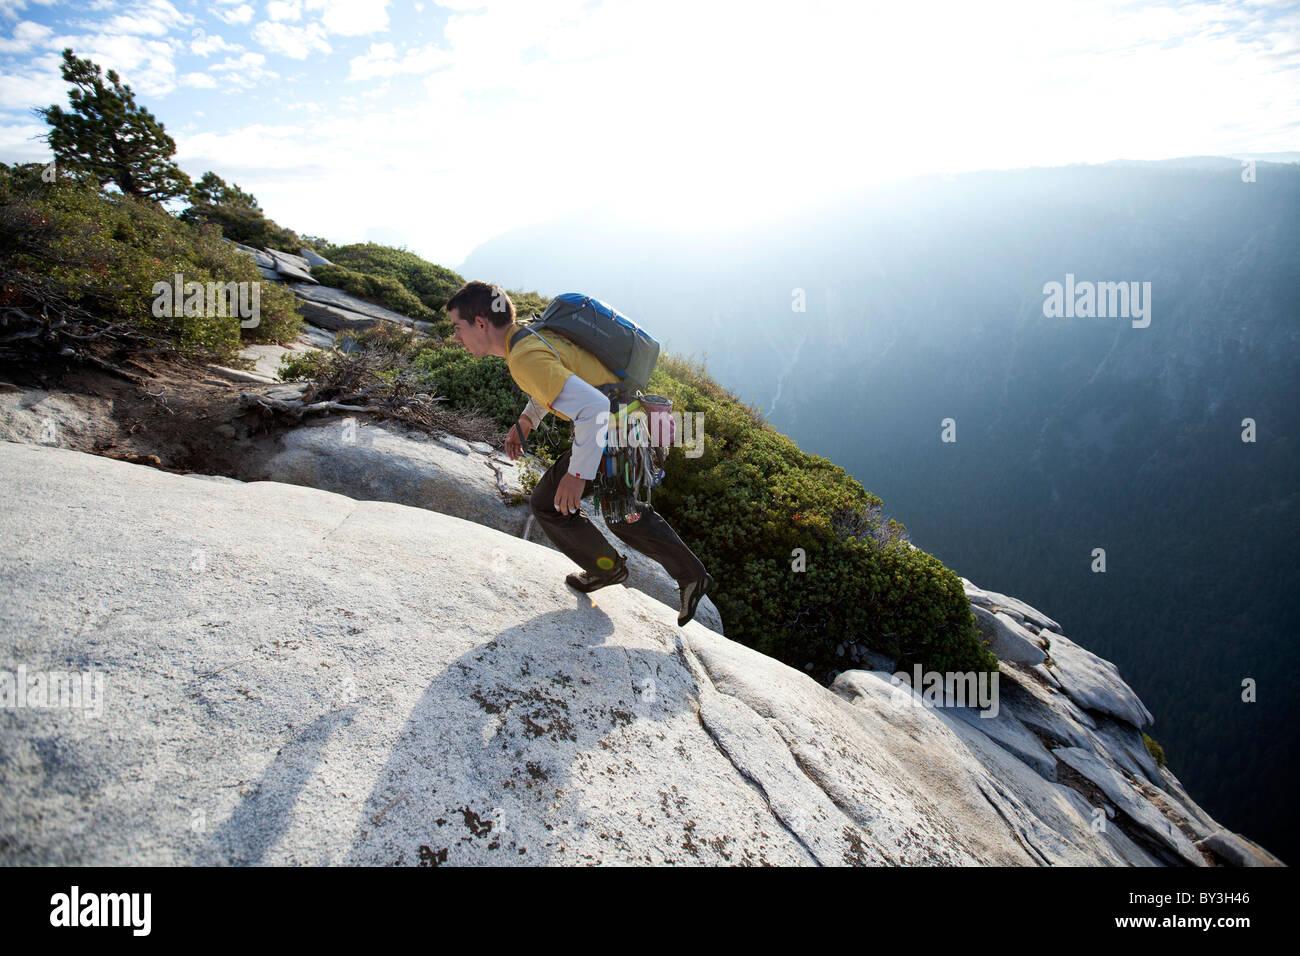 Alex Honnold solos The Nose on El Capitan in Yosemite National Park, California. Stock Photo